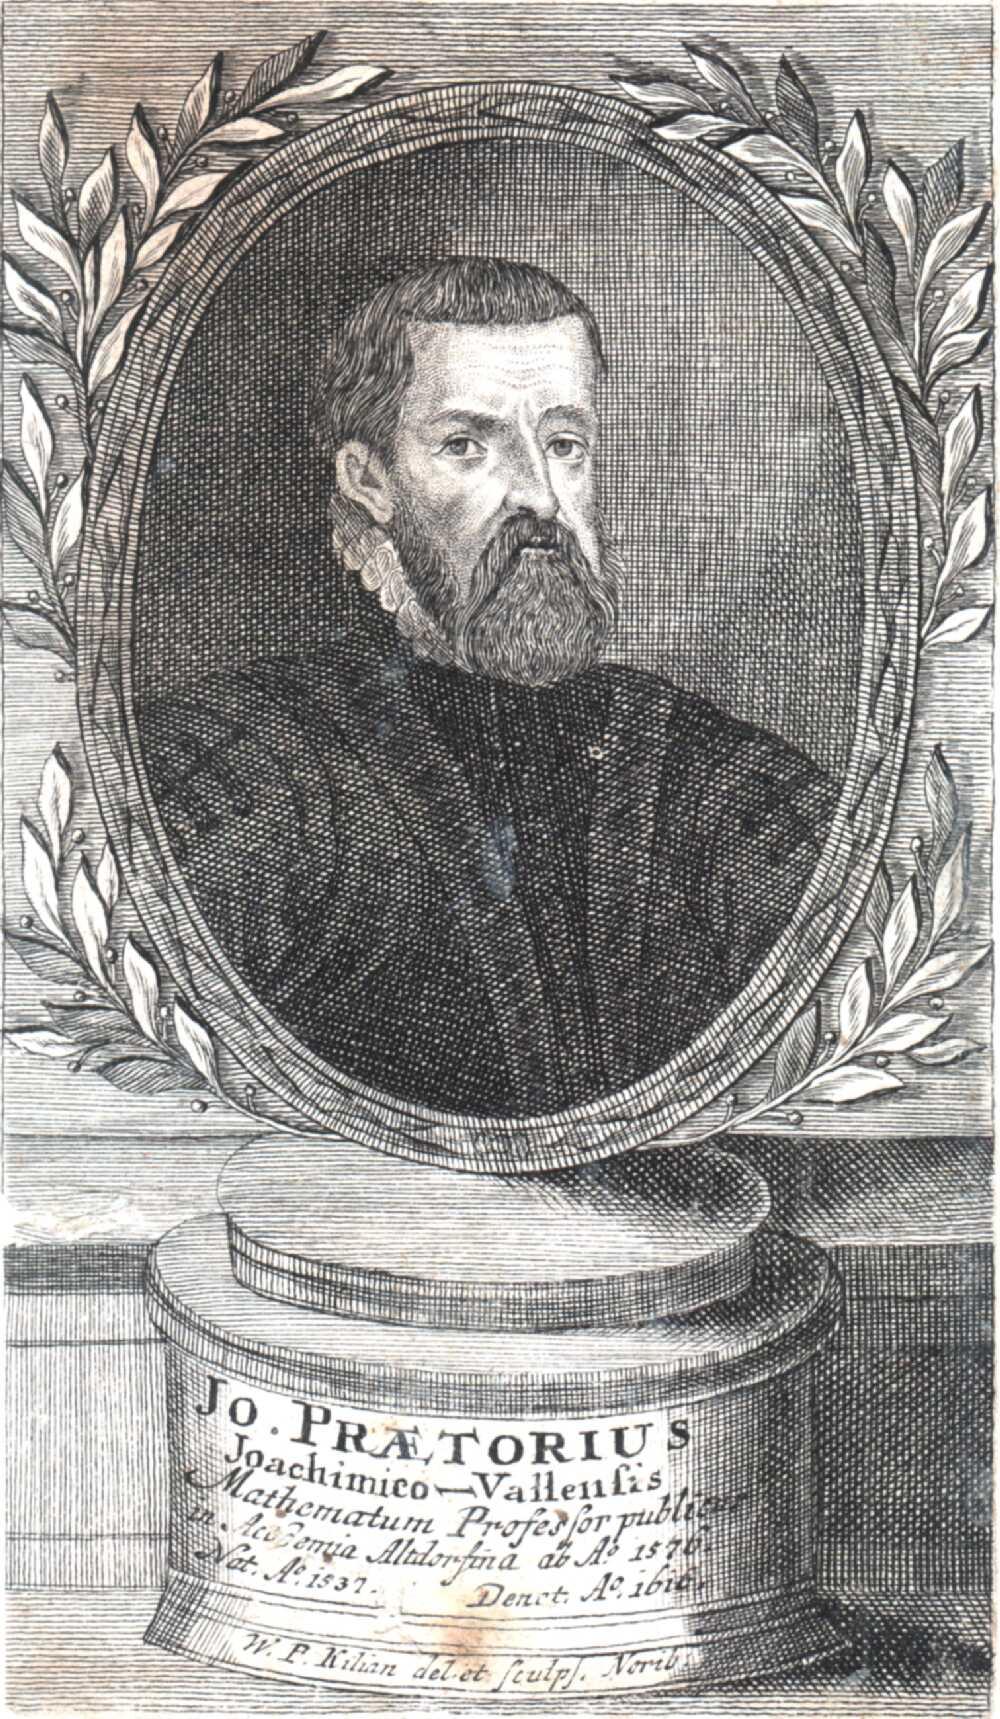 Portrait of Johann Praetorius,  Image number:SIL14-P006-01a